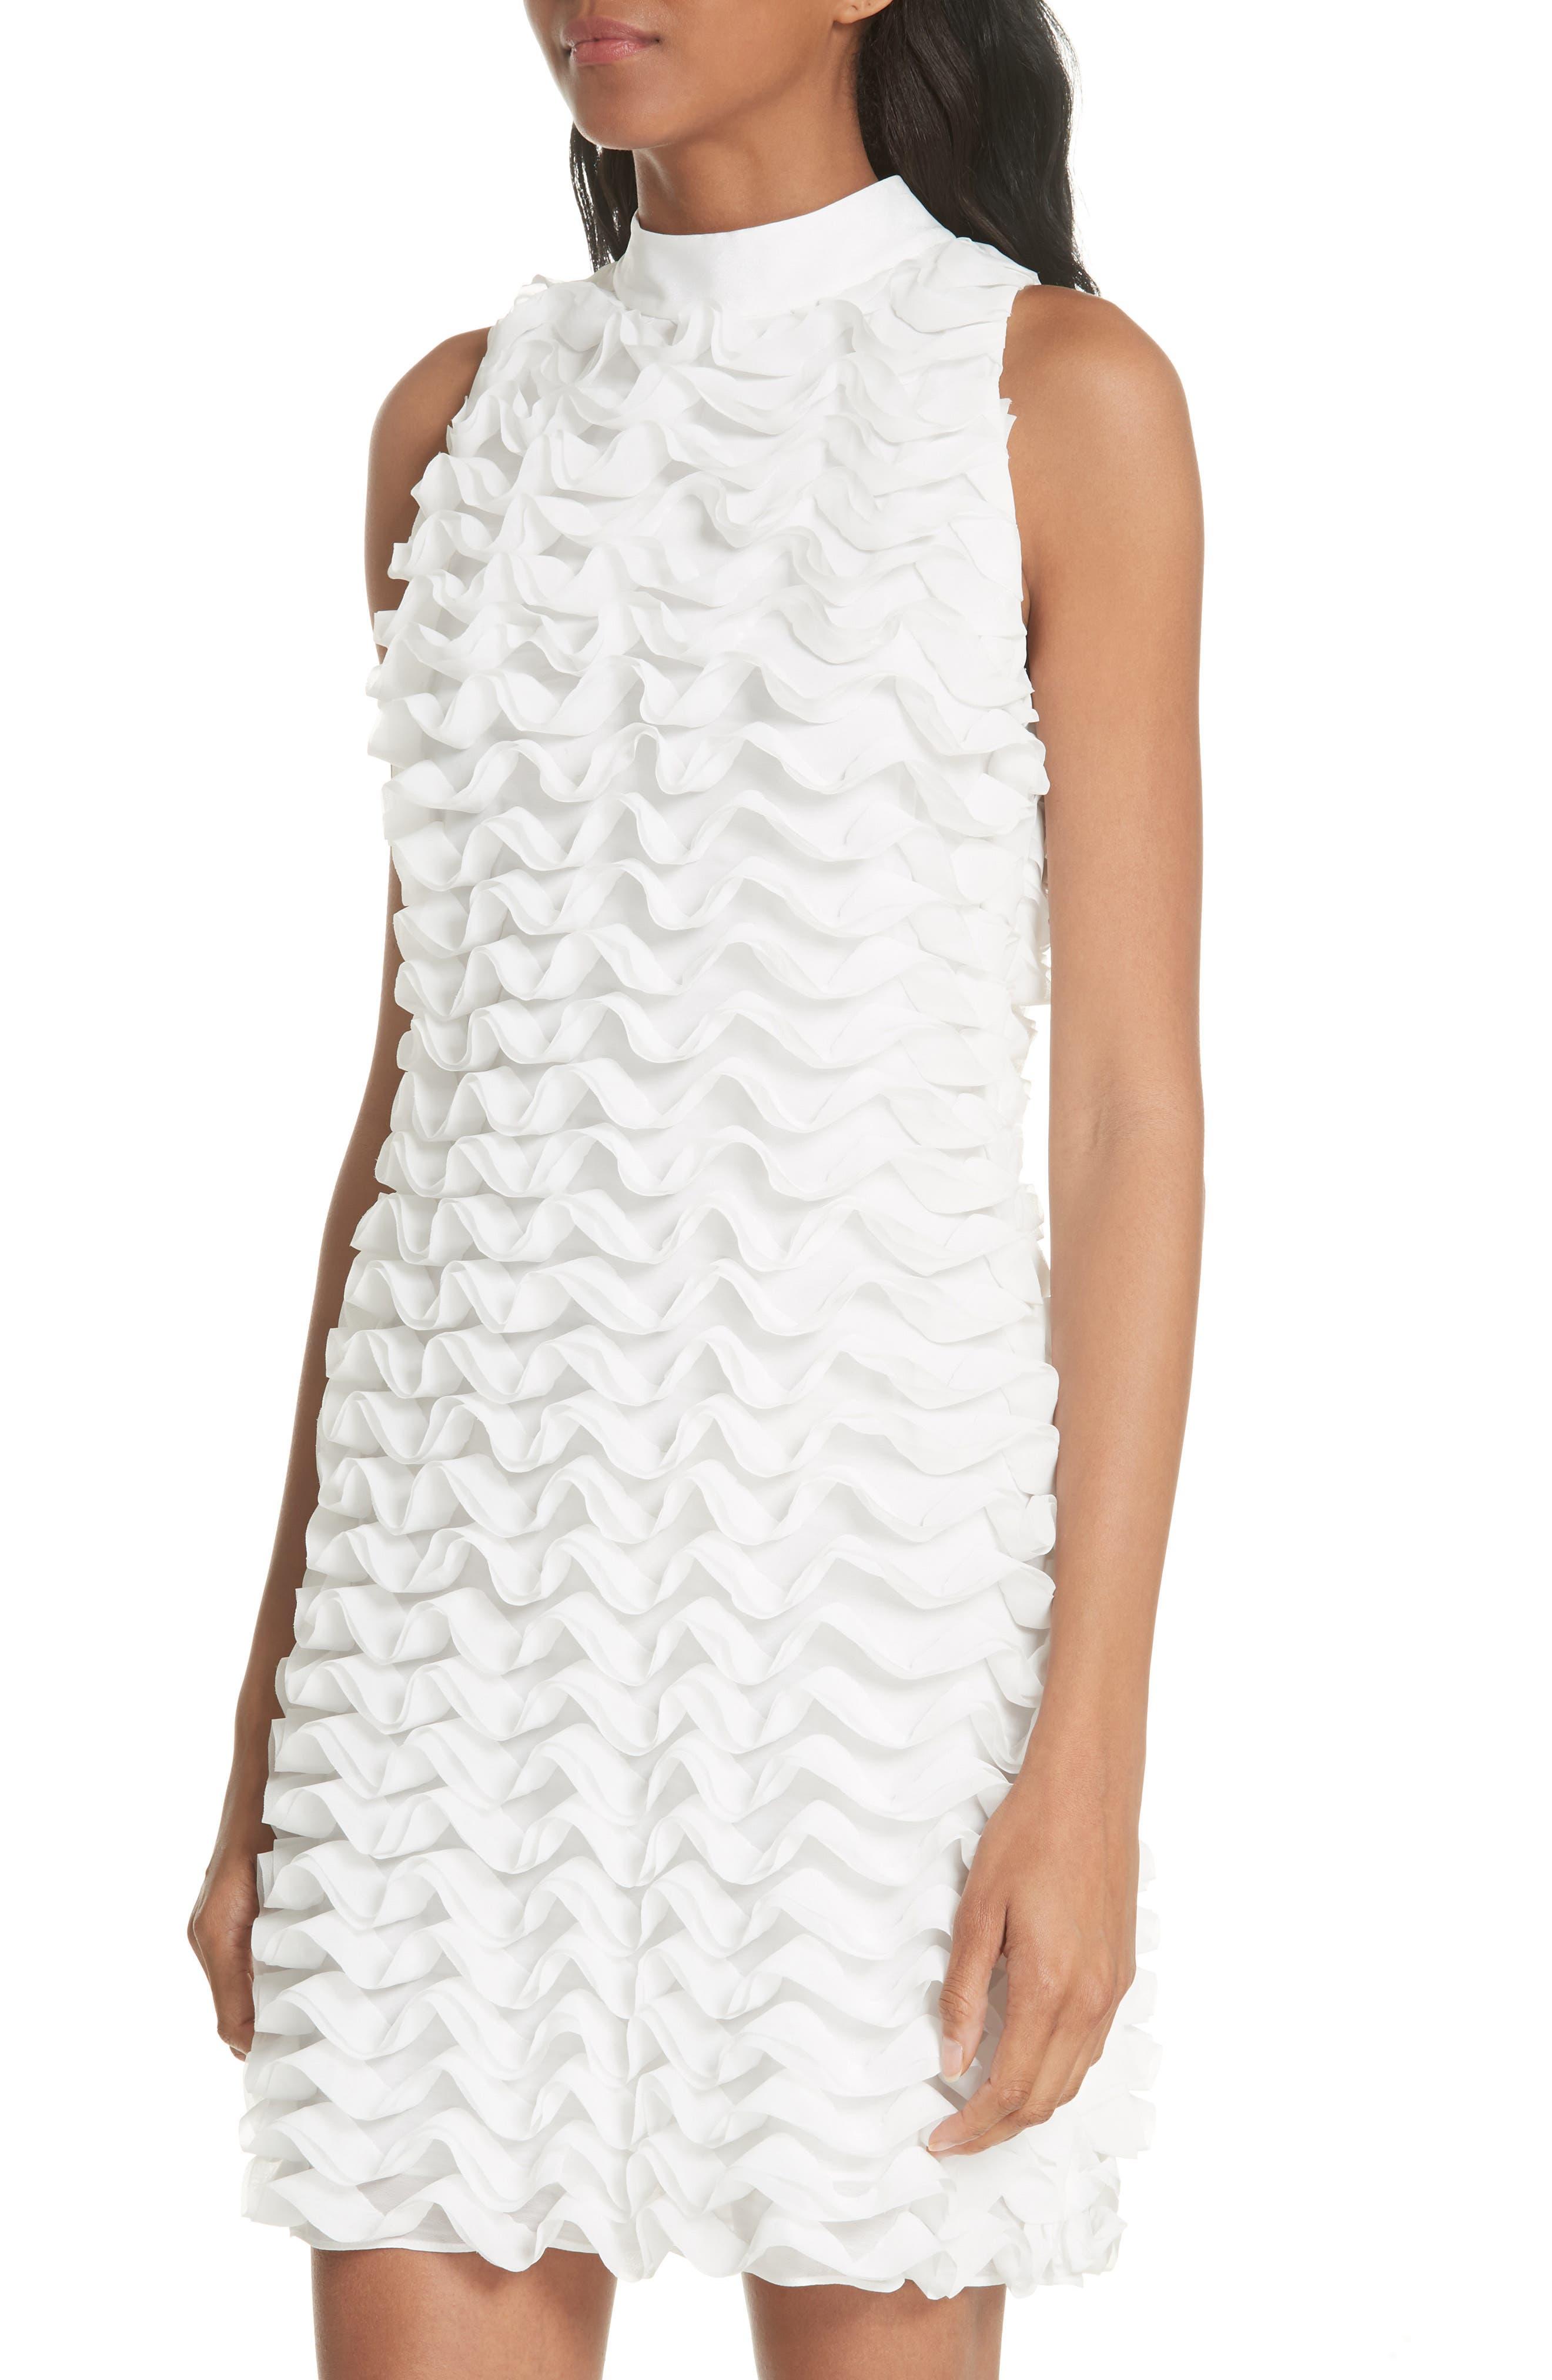 Ruffled Tunic Dress,                             Alternate thumbnail 4, color,                             White